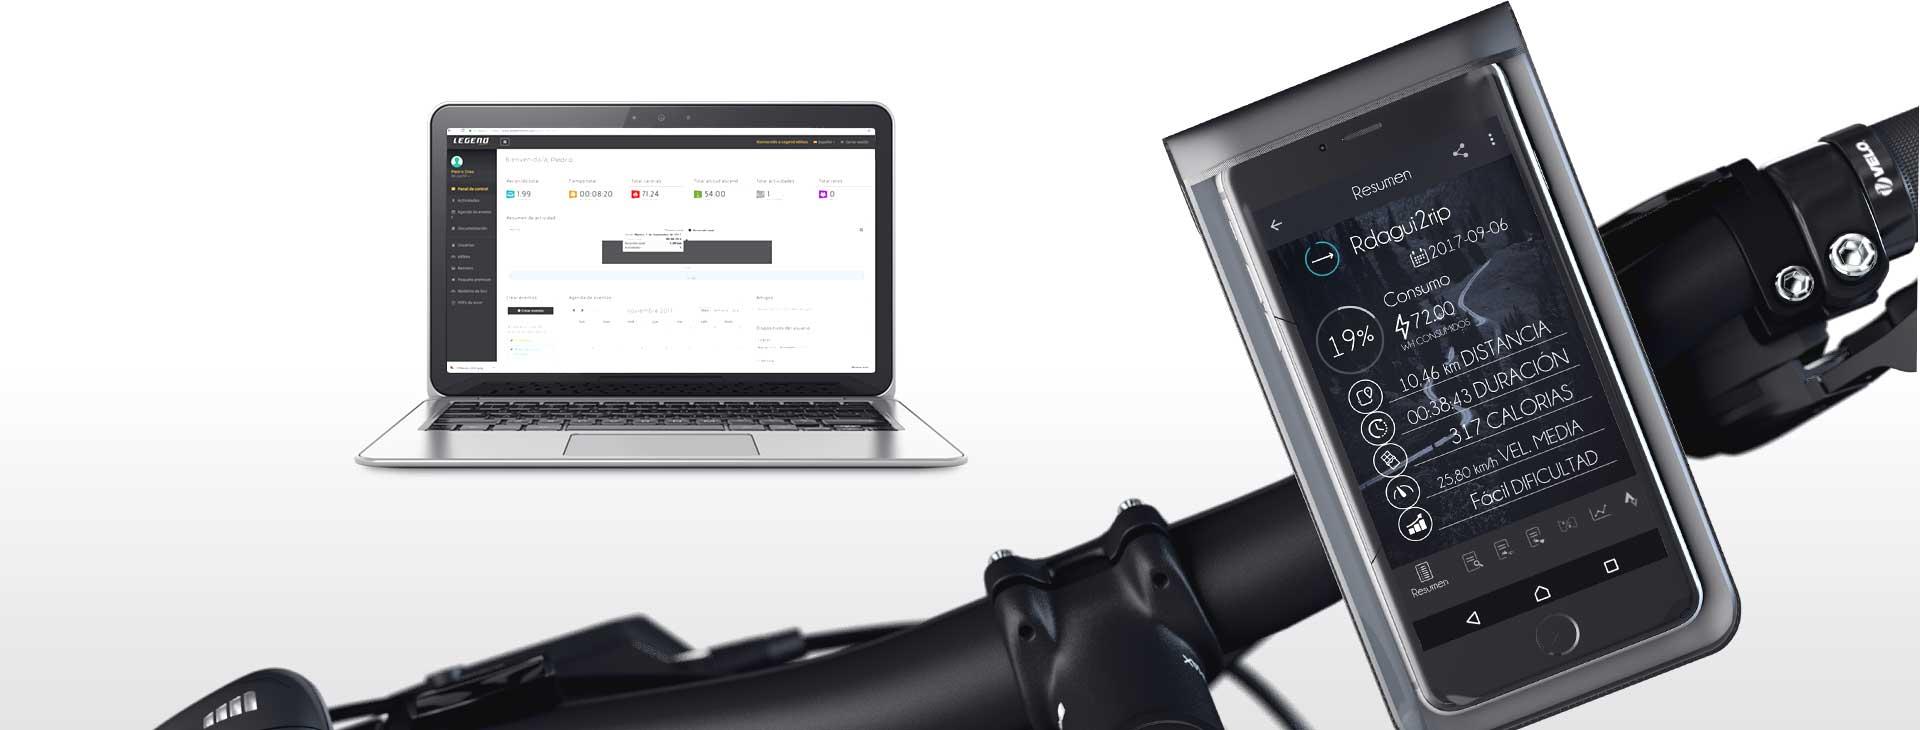 Smart Legend Etna Folding Electric Mountain Bike 500W Standard Battery 10.4ah Black